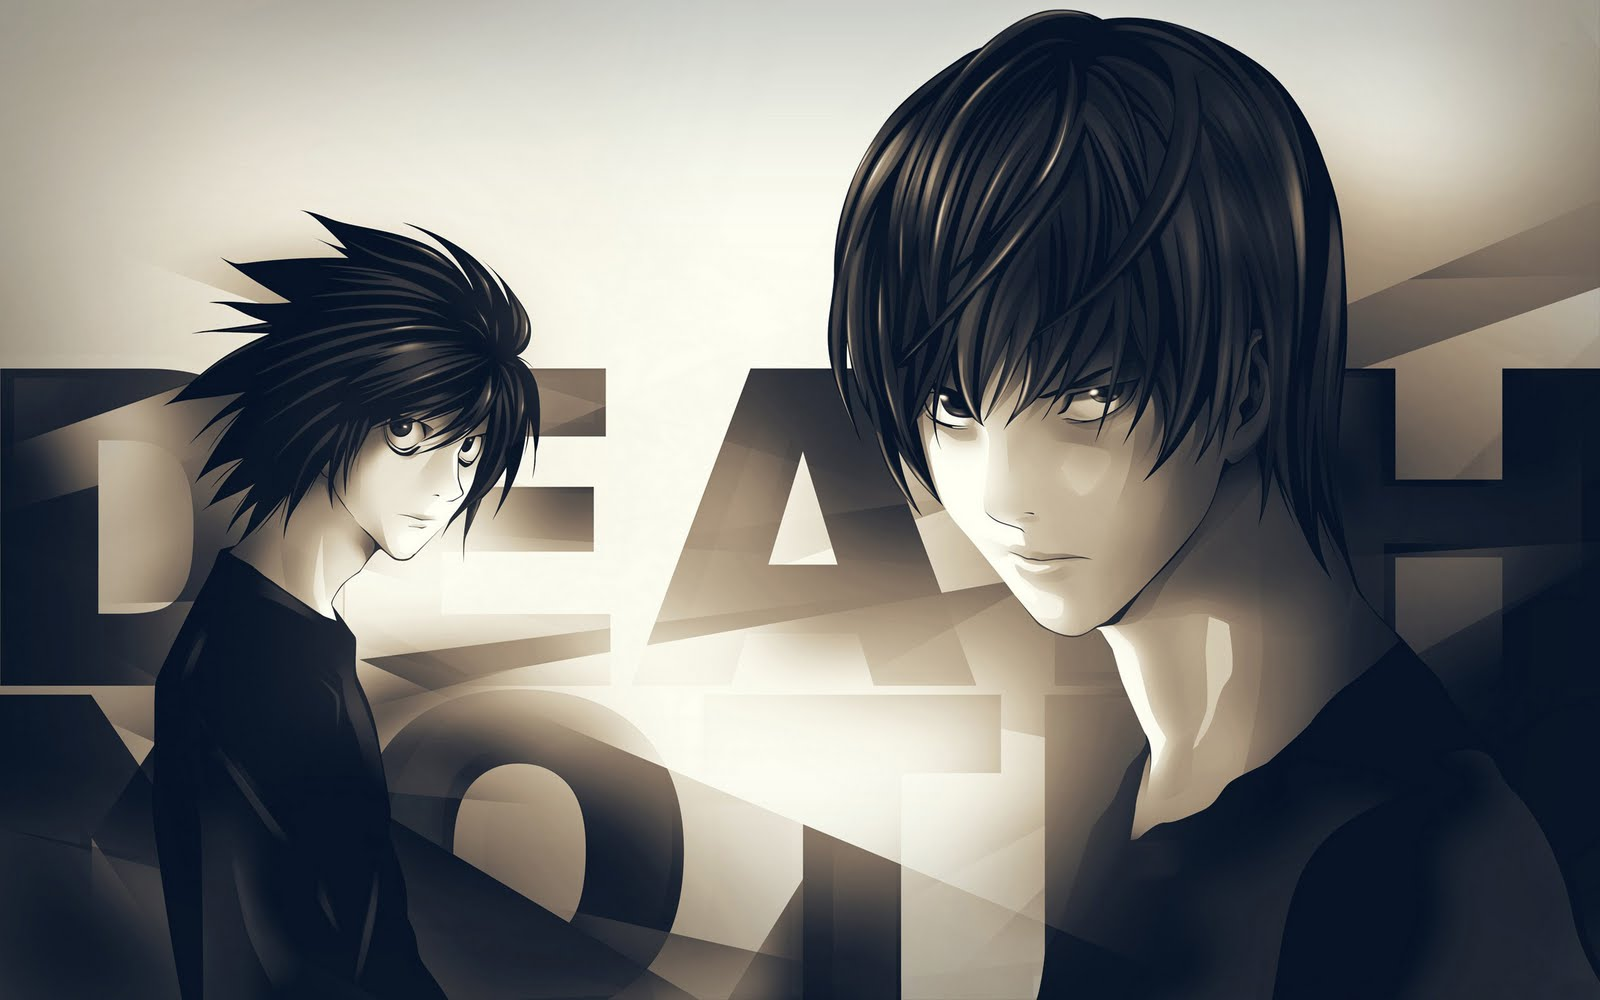 Anime boys hd wallpaper wallpaper full hd wallpapers and - Anime boy hd wallpaper ...